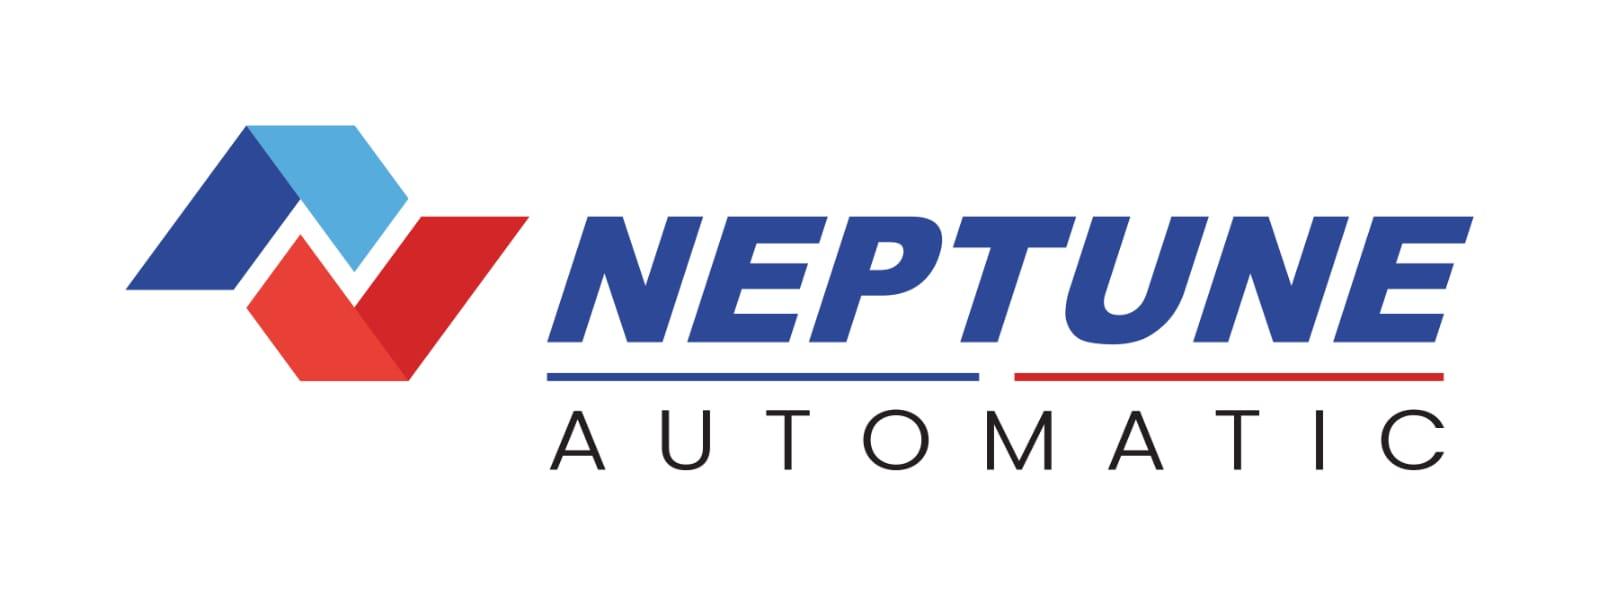 Neptune Automatic